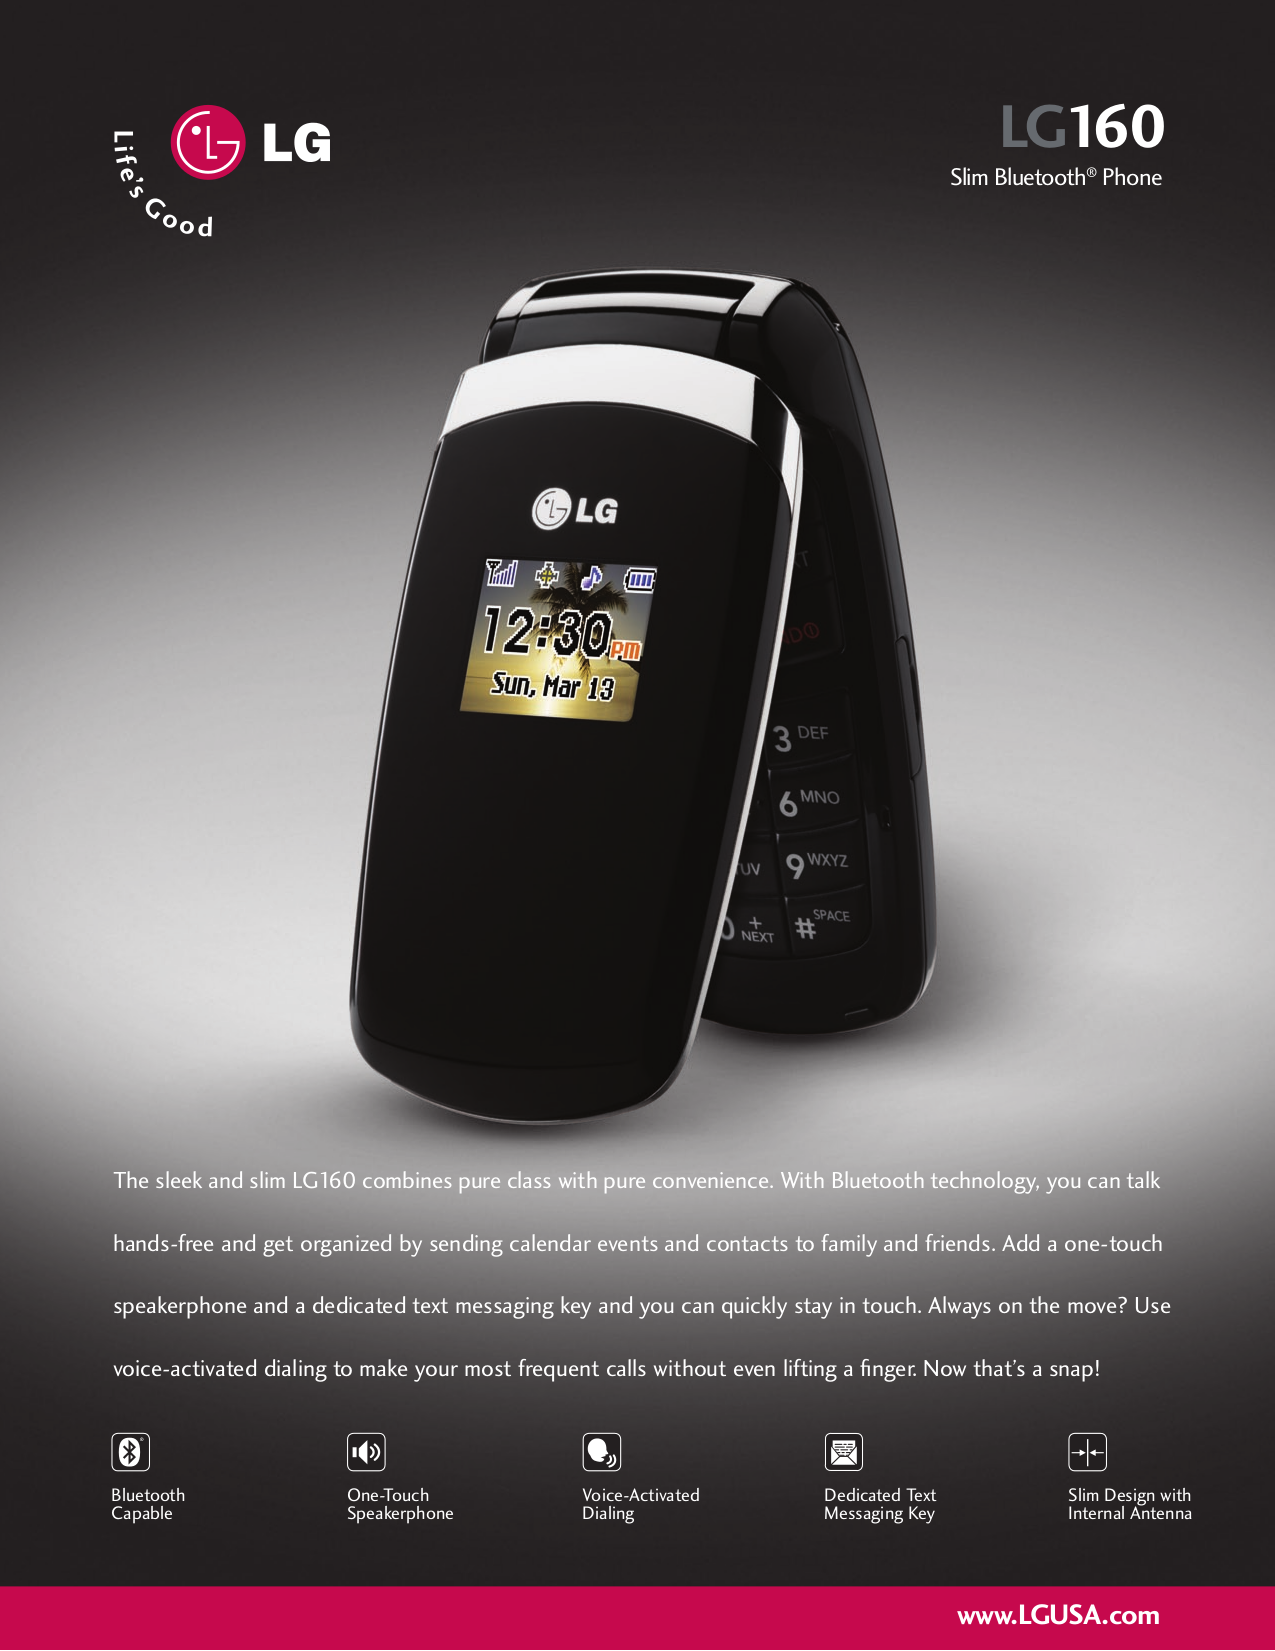 download free pdf for lg lg160 cell phone manual rh umlib com LG Phone Manuals User Guides LG Cell Phone Operating Manual